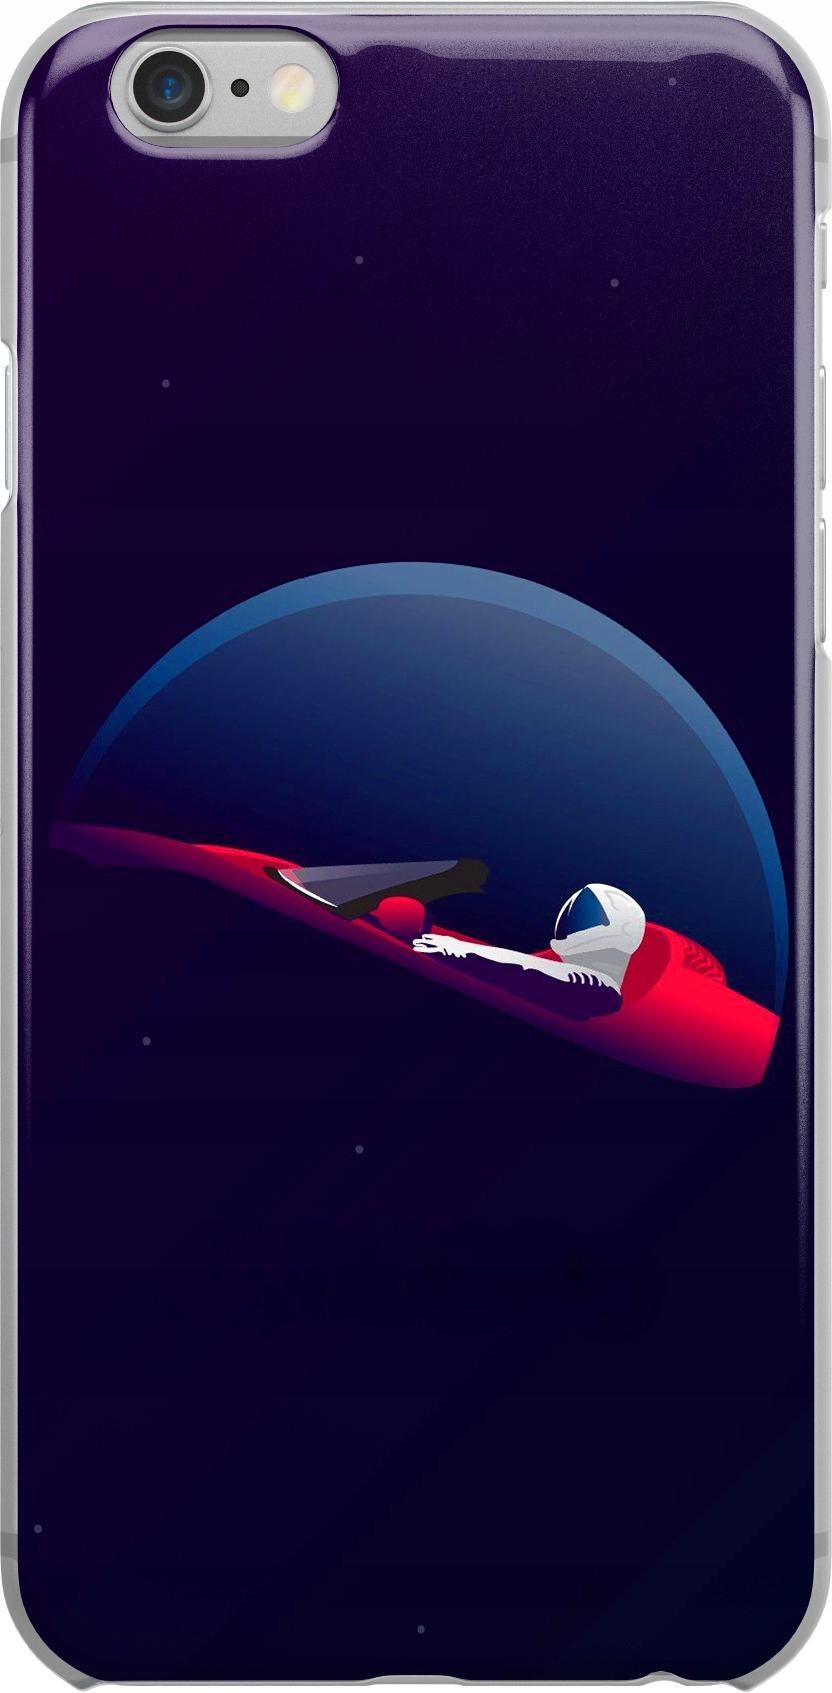 Etui Wzory SpaceX Huawei Y625